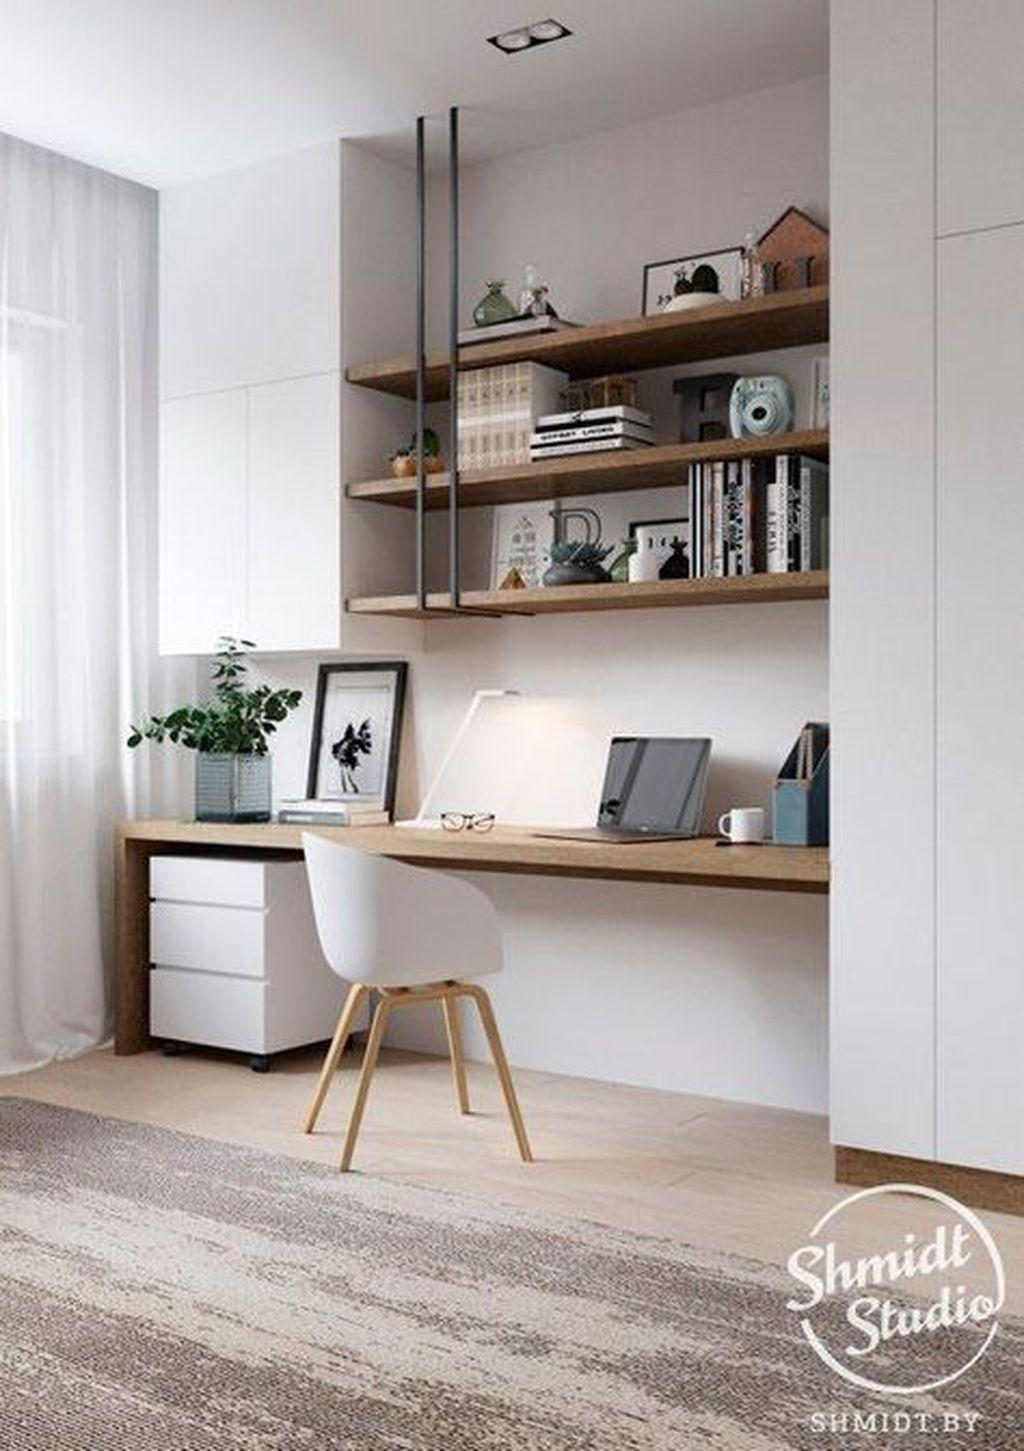 20 Best Ways To Decor Your Bedroom With A Scandinavian Design